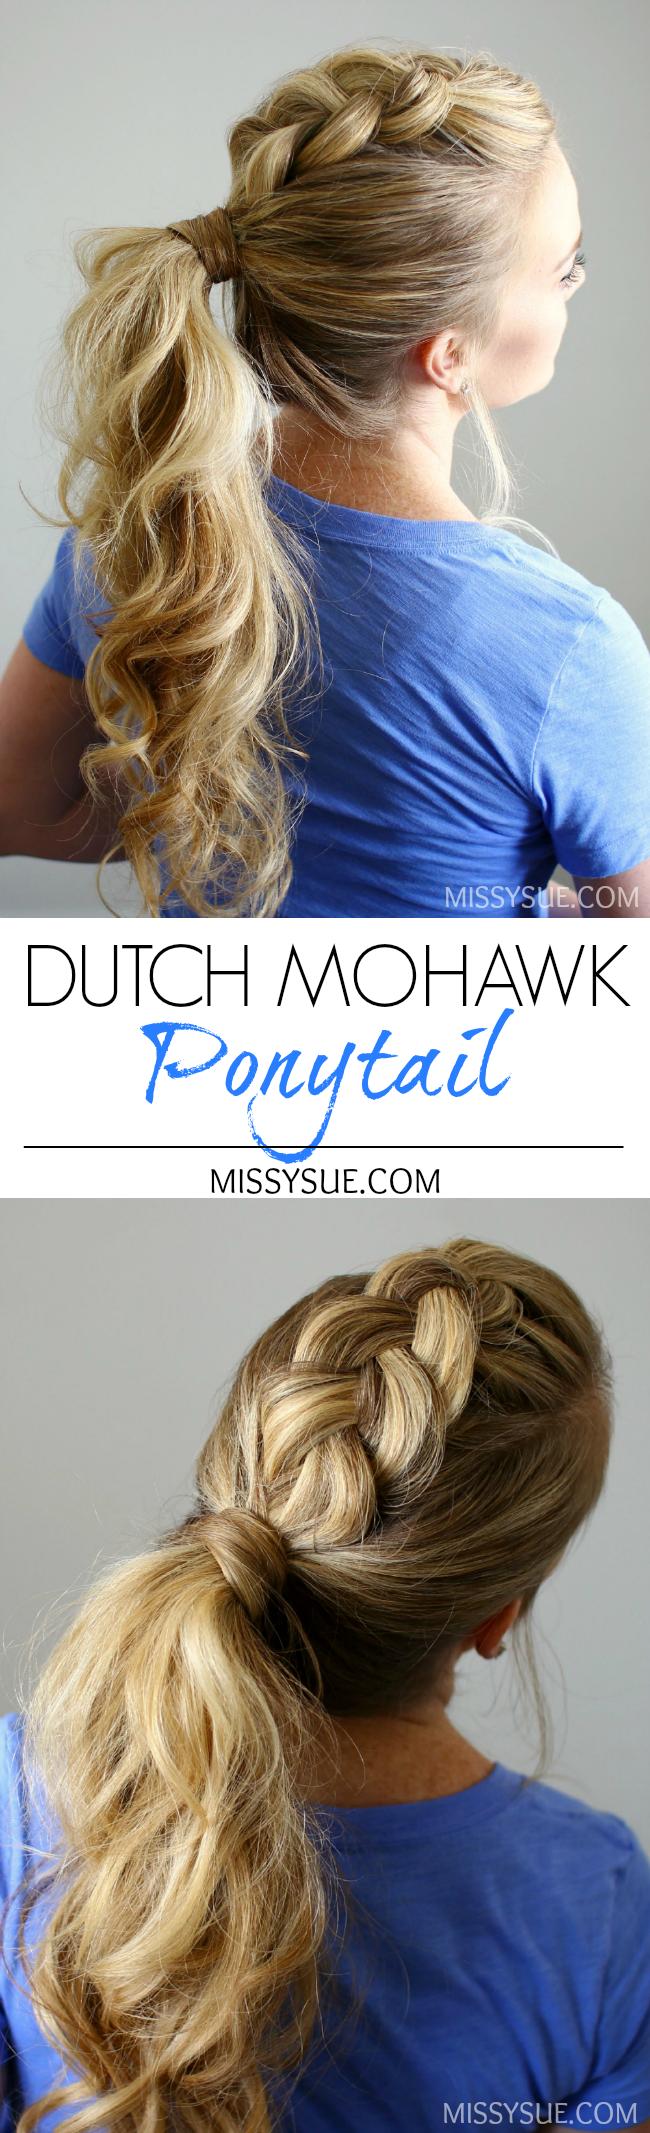 Dutchmohawkponytailtutorialmissysue cabelos pinterest